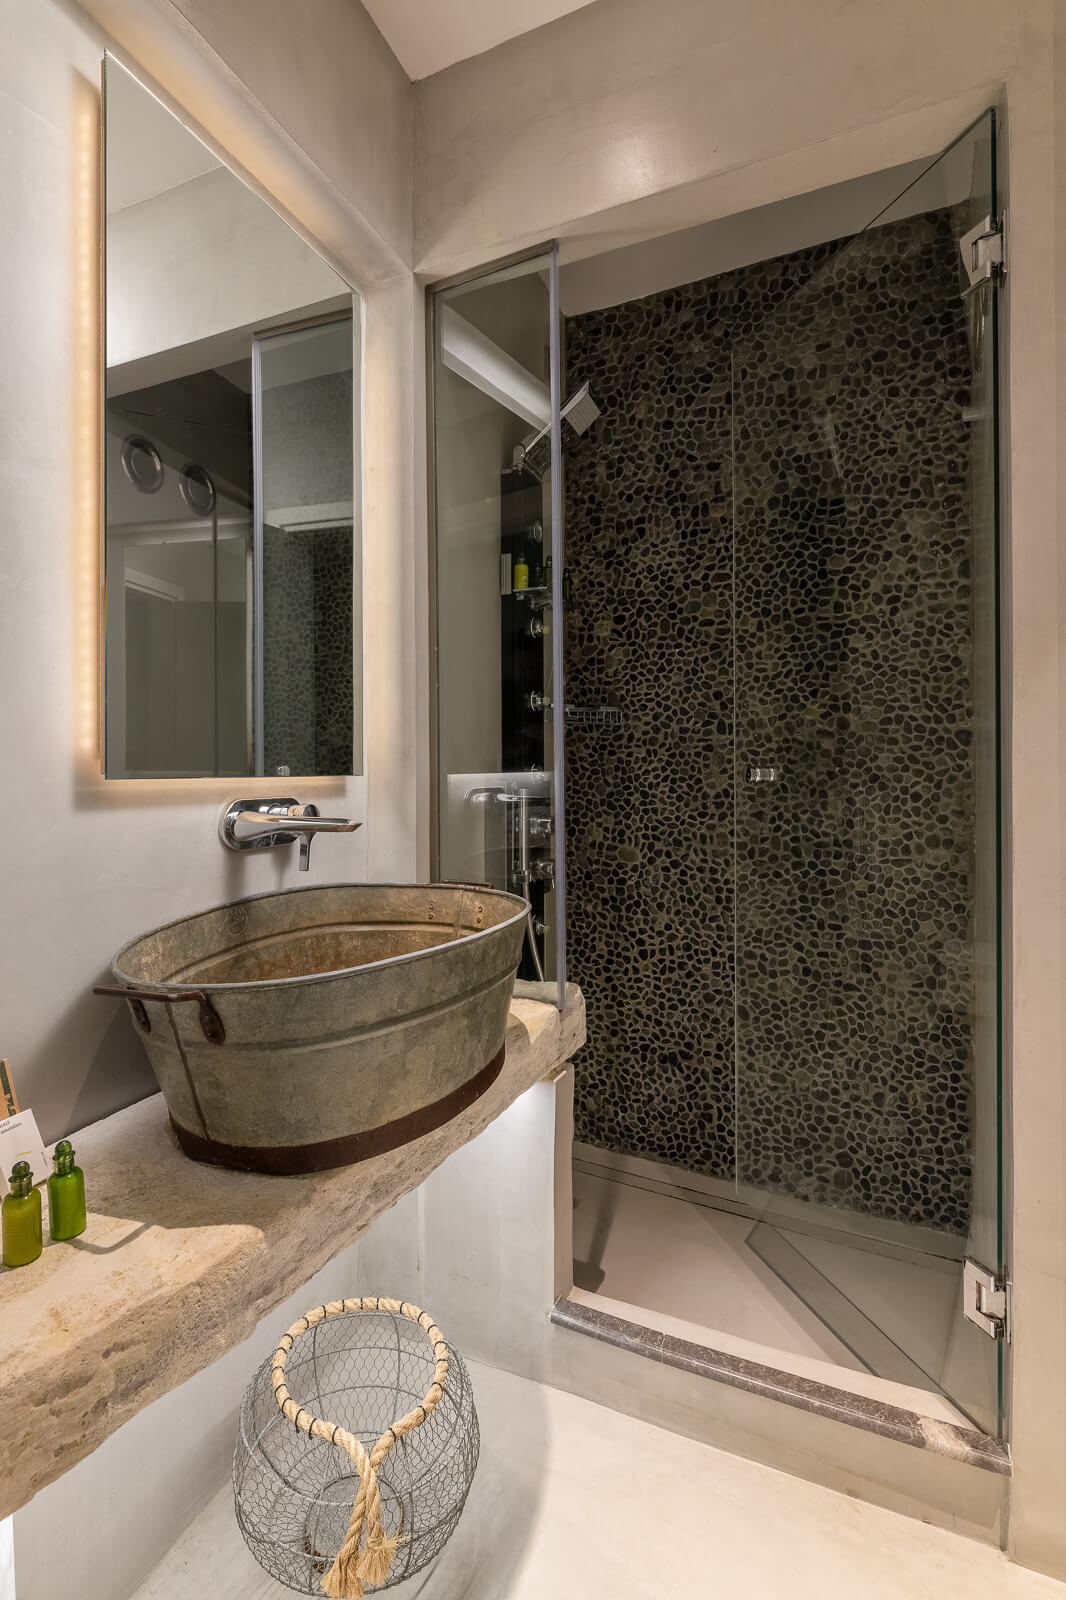 Nisos Hotel Bathroom - Elakati Best Hotel in Rhodes Greece